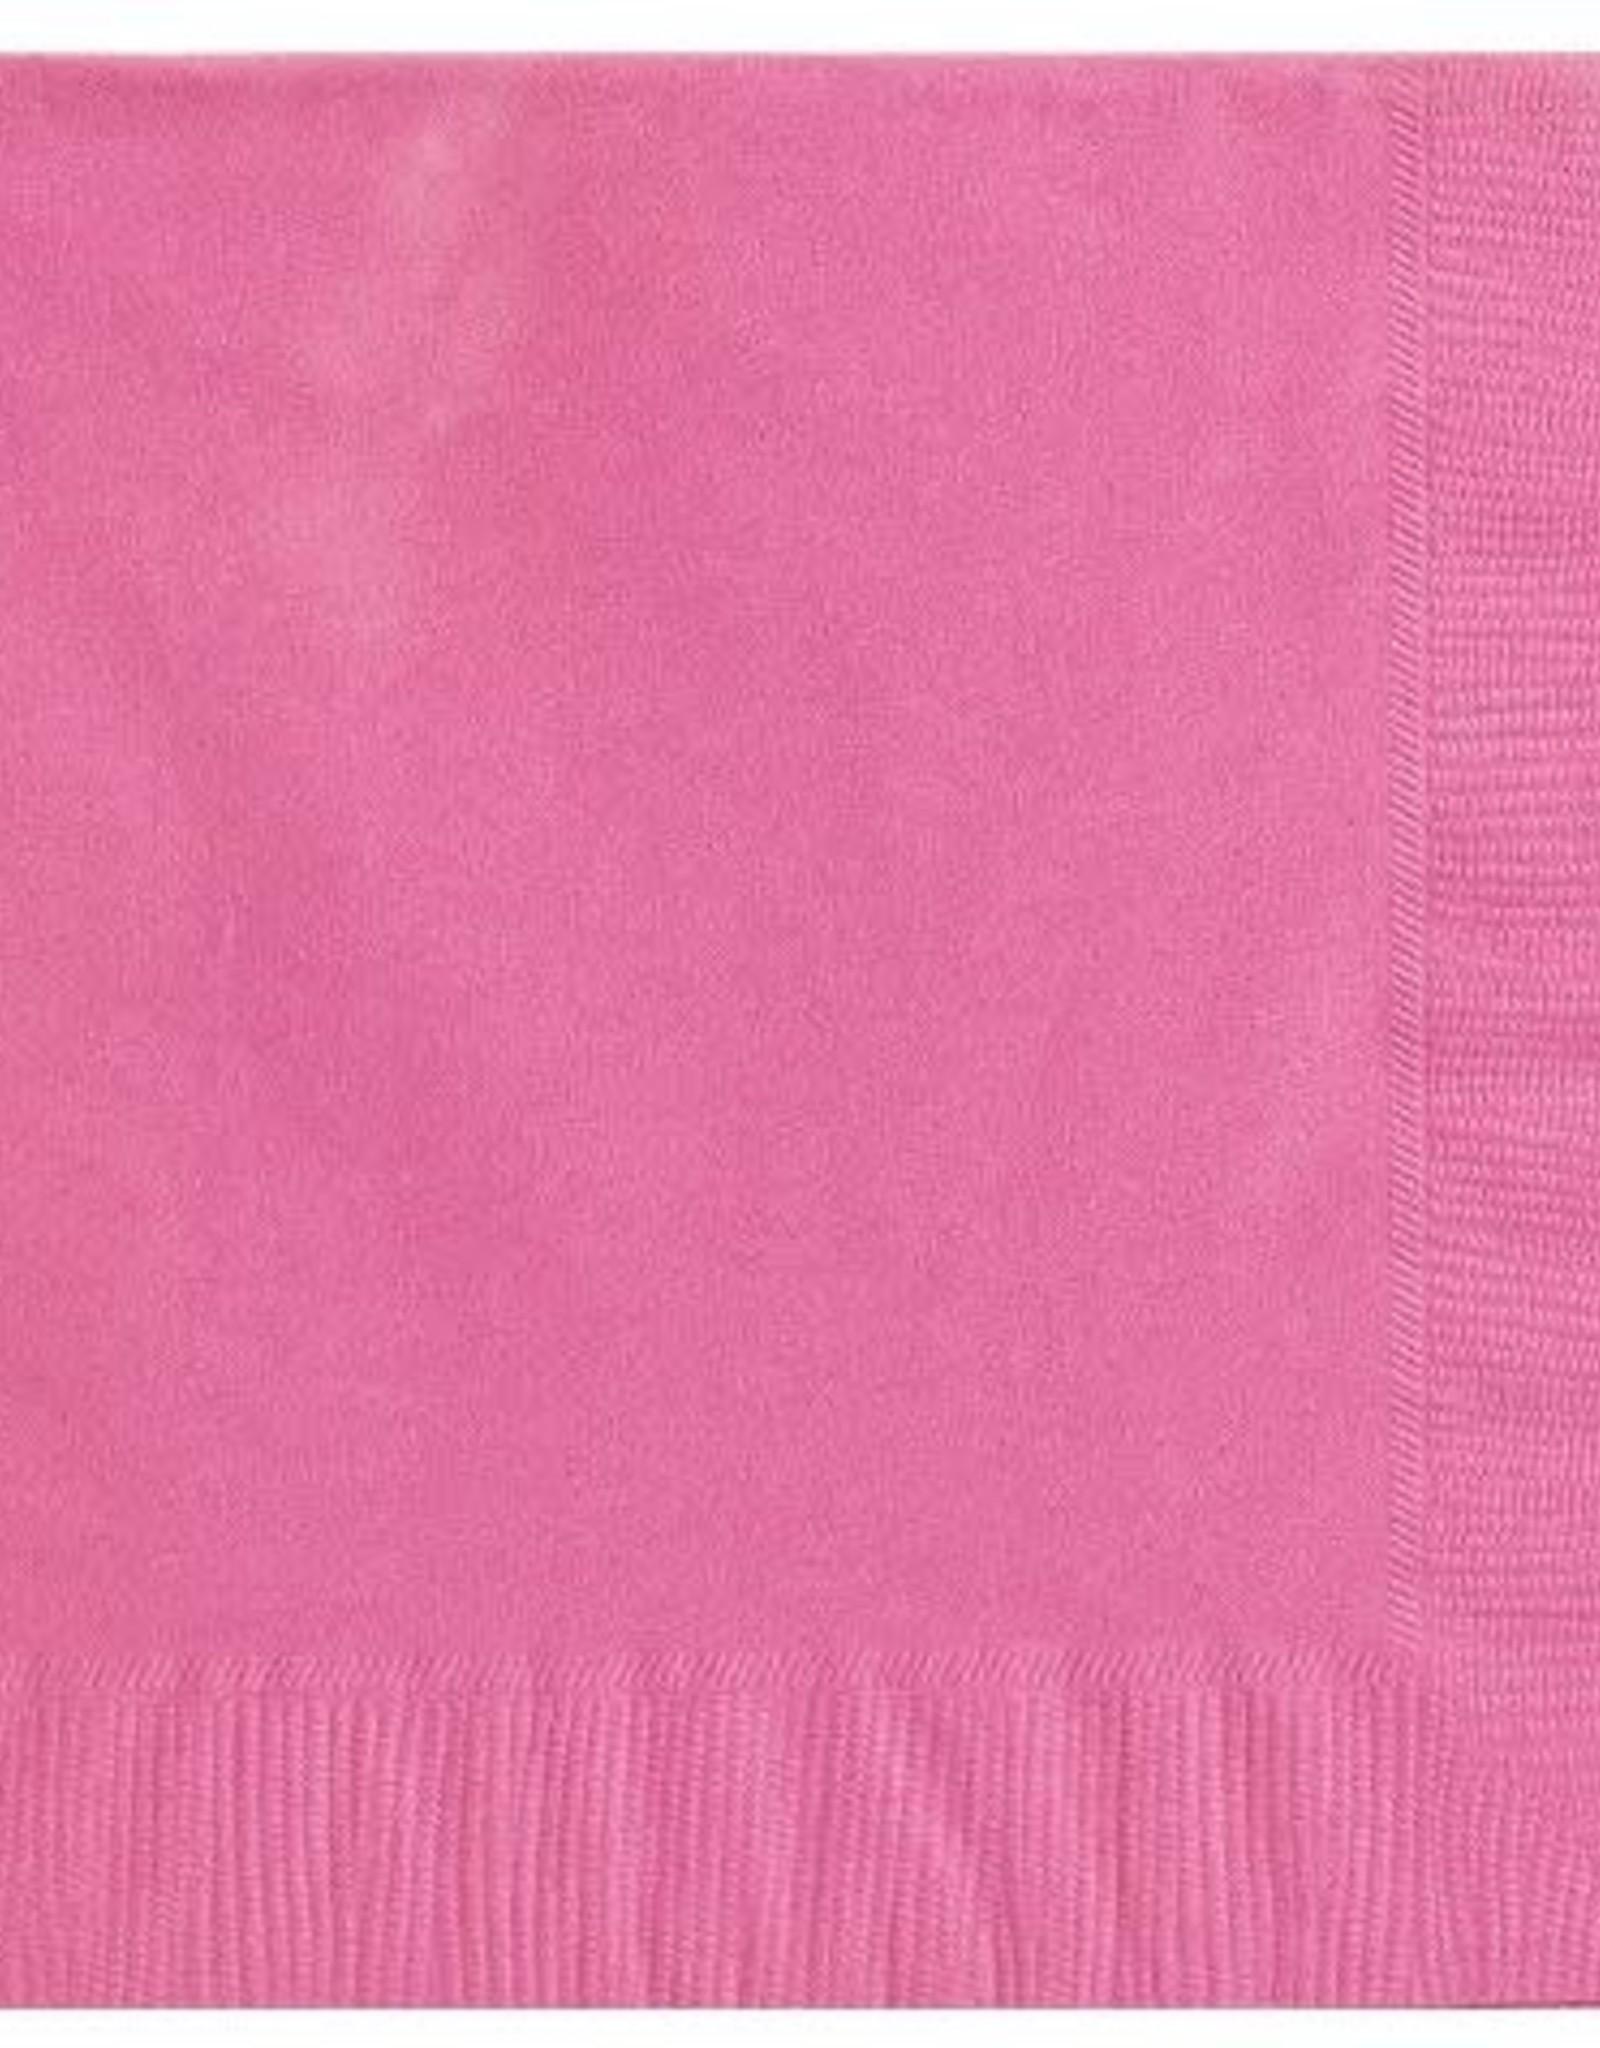 Bright Pink 2 ply Dinner Napkin 50 ct